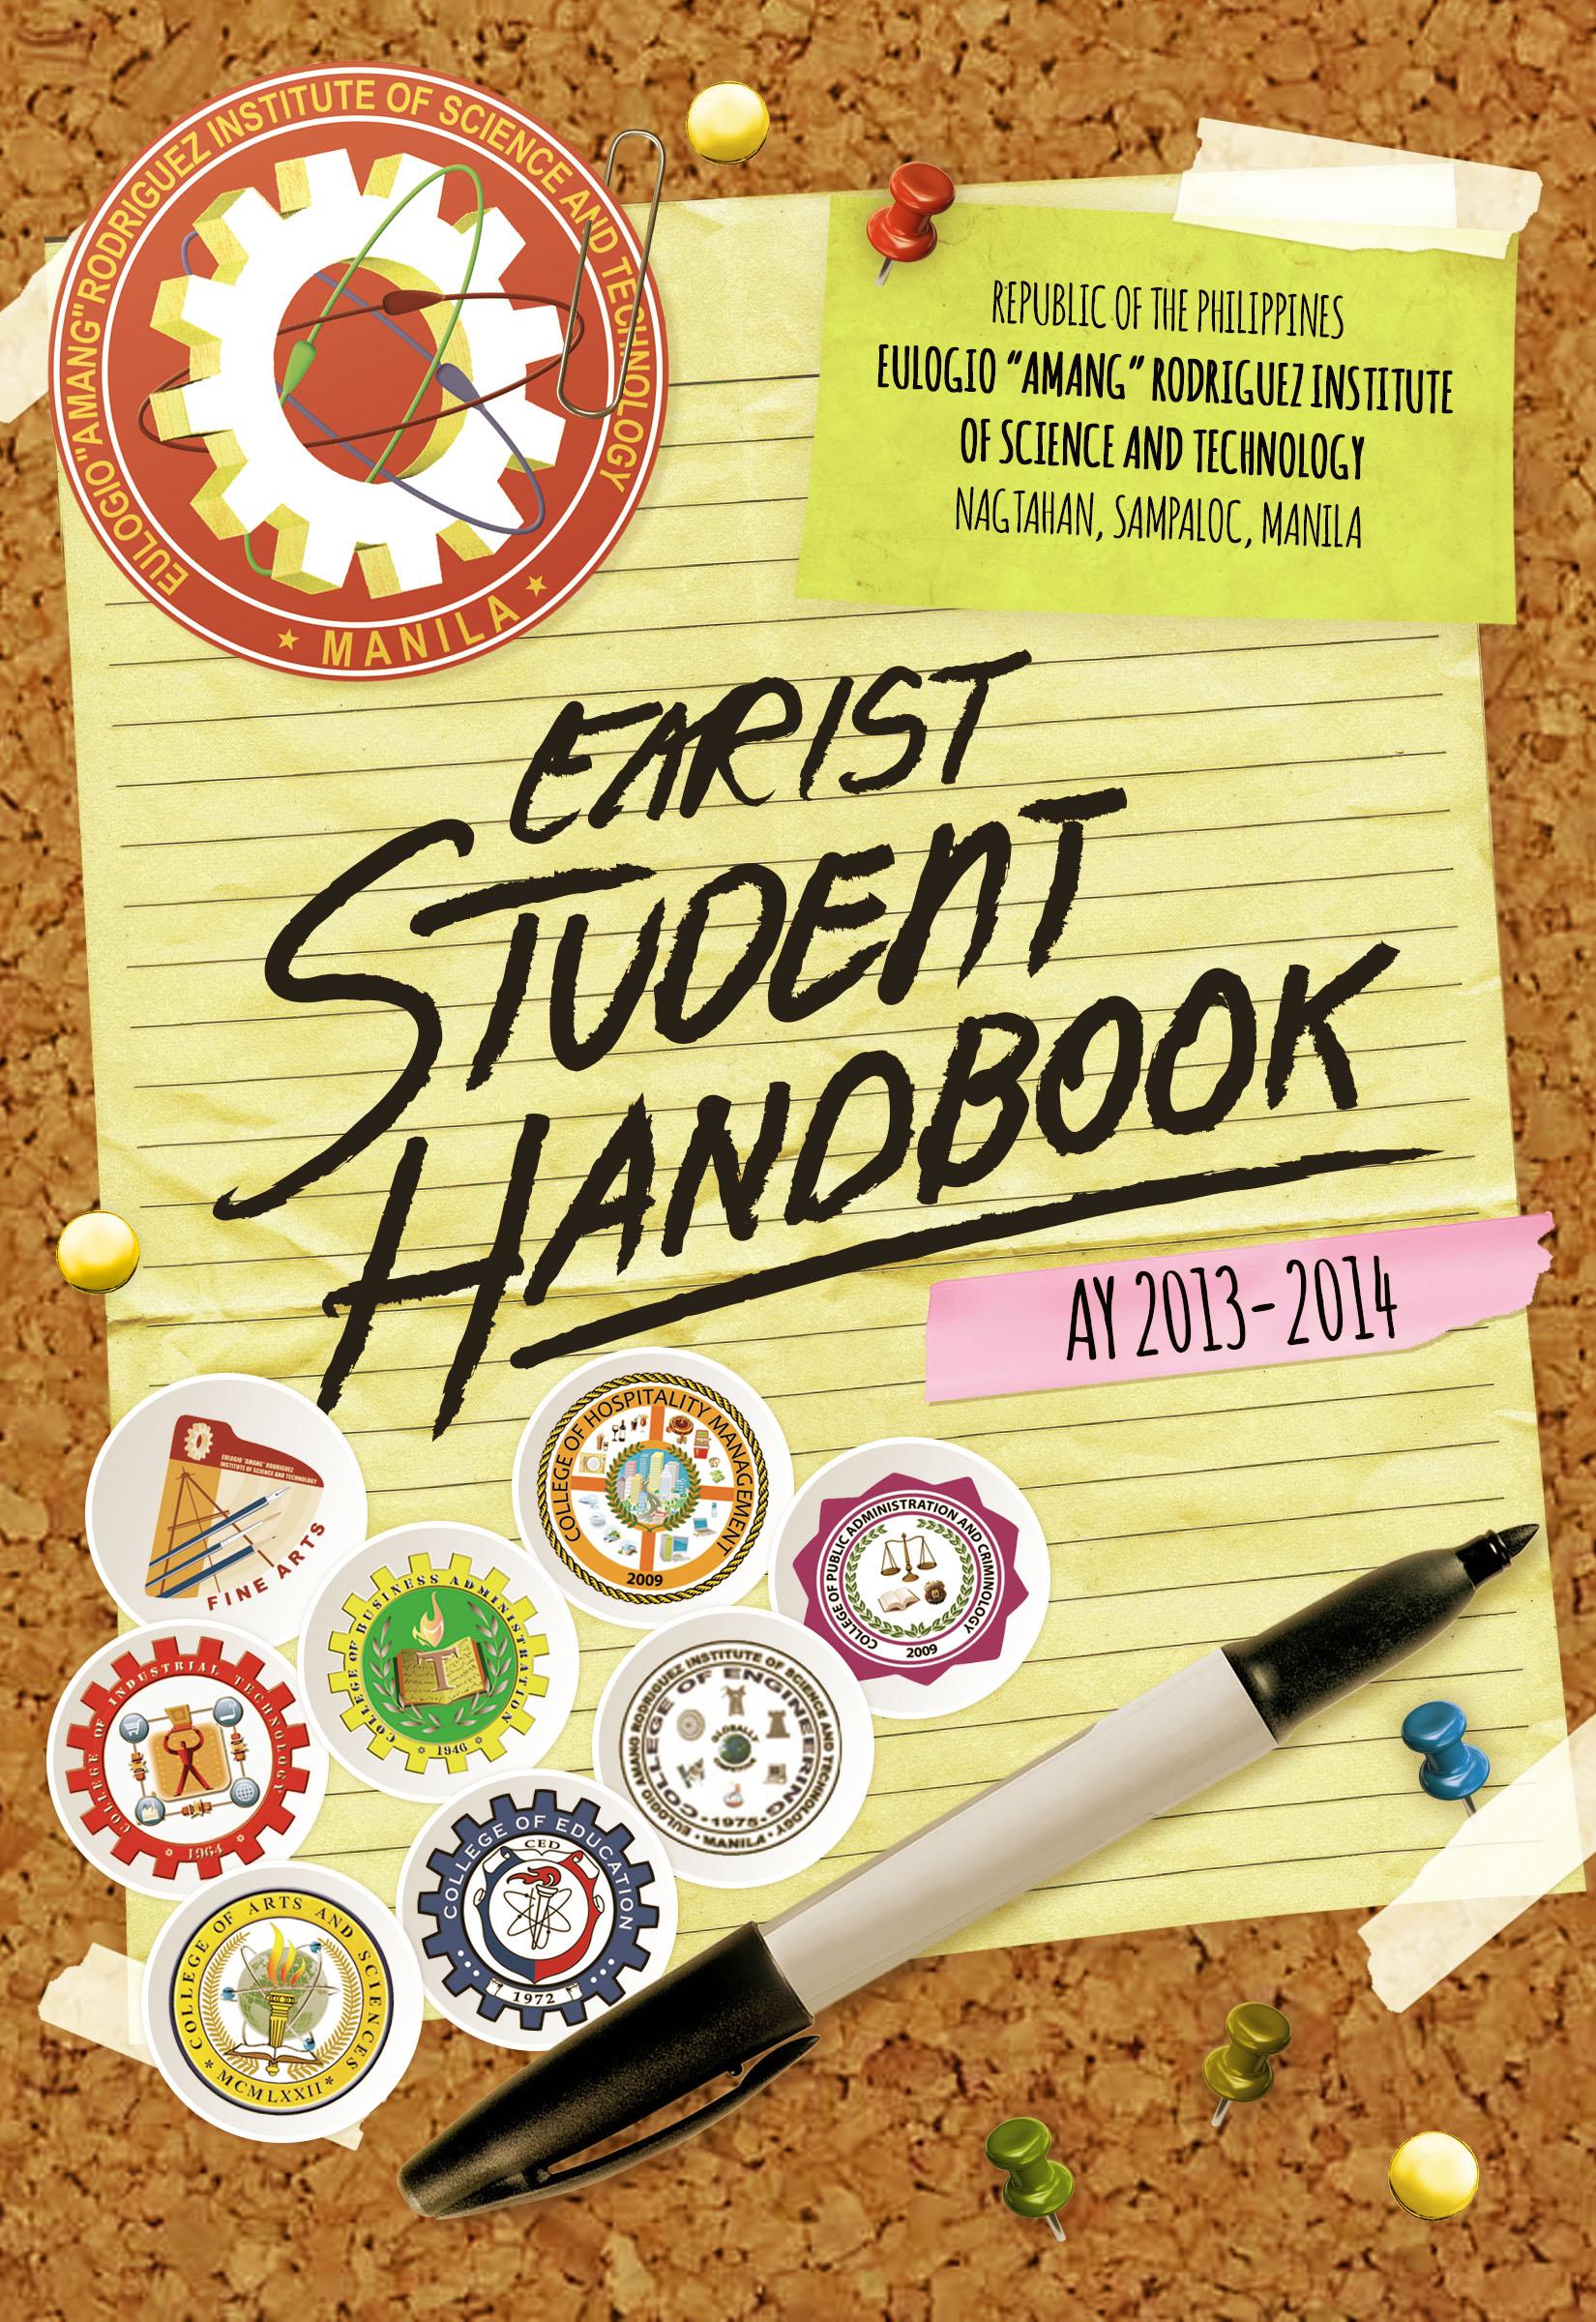 Hand Book Cover Design : Student handbook cover design by timothydiokno on deviantart